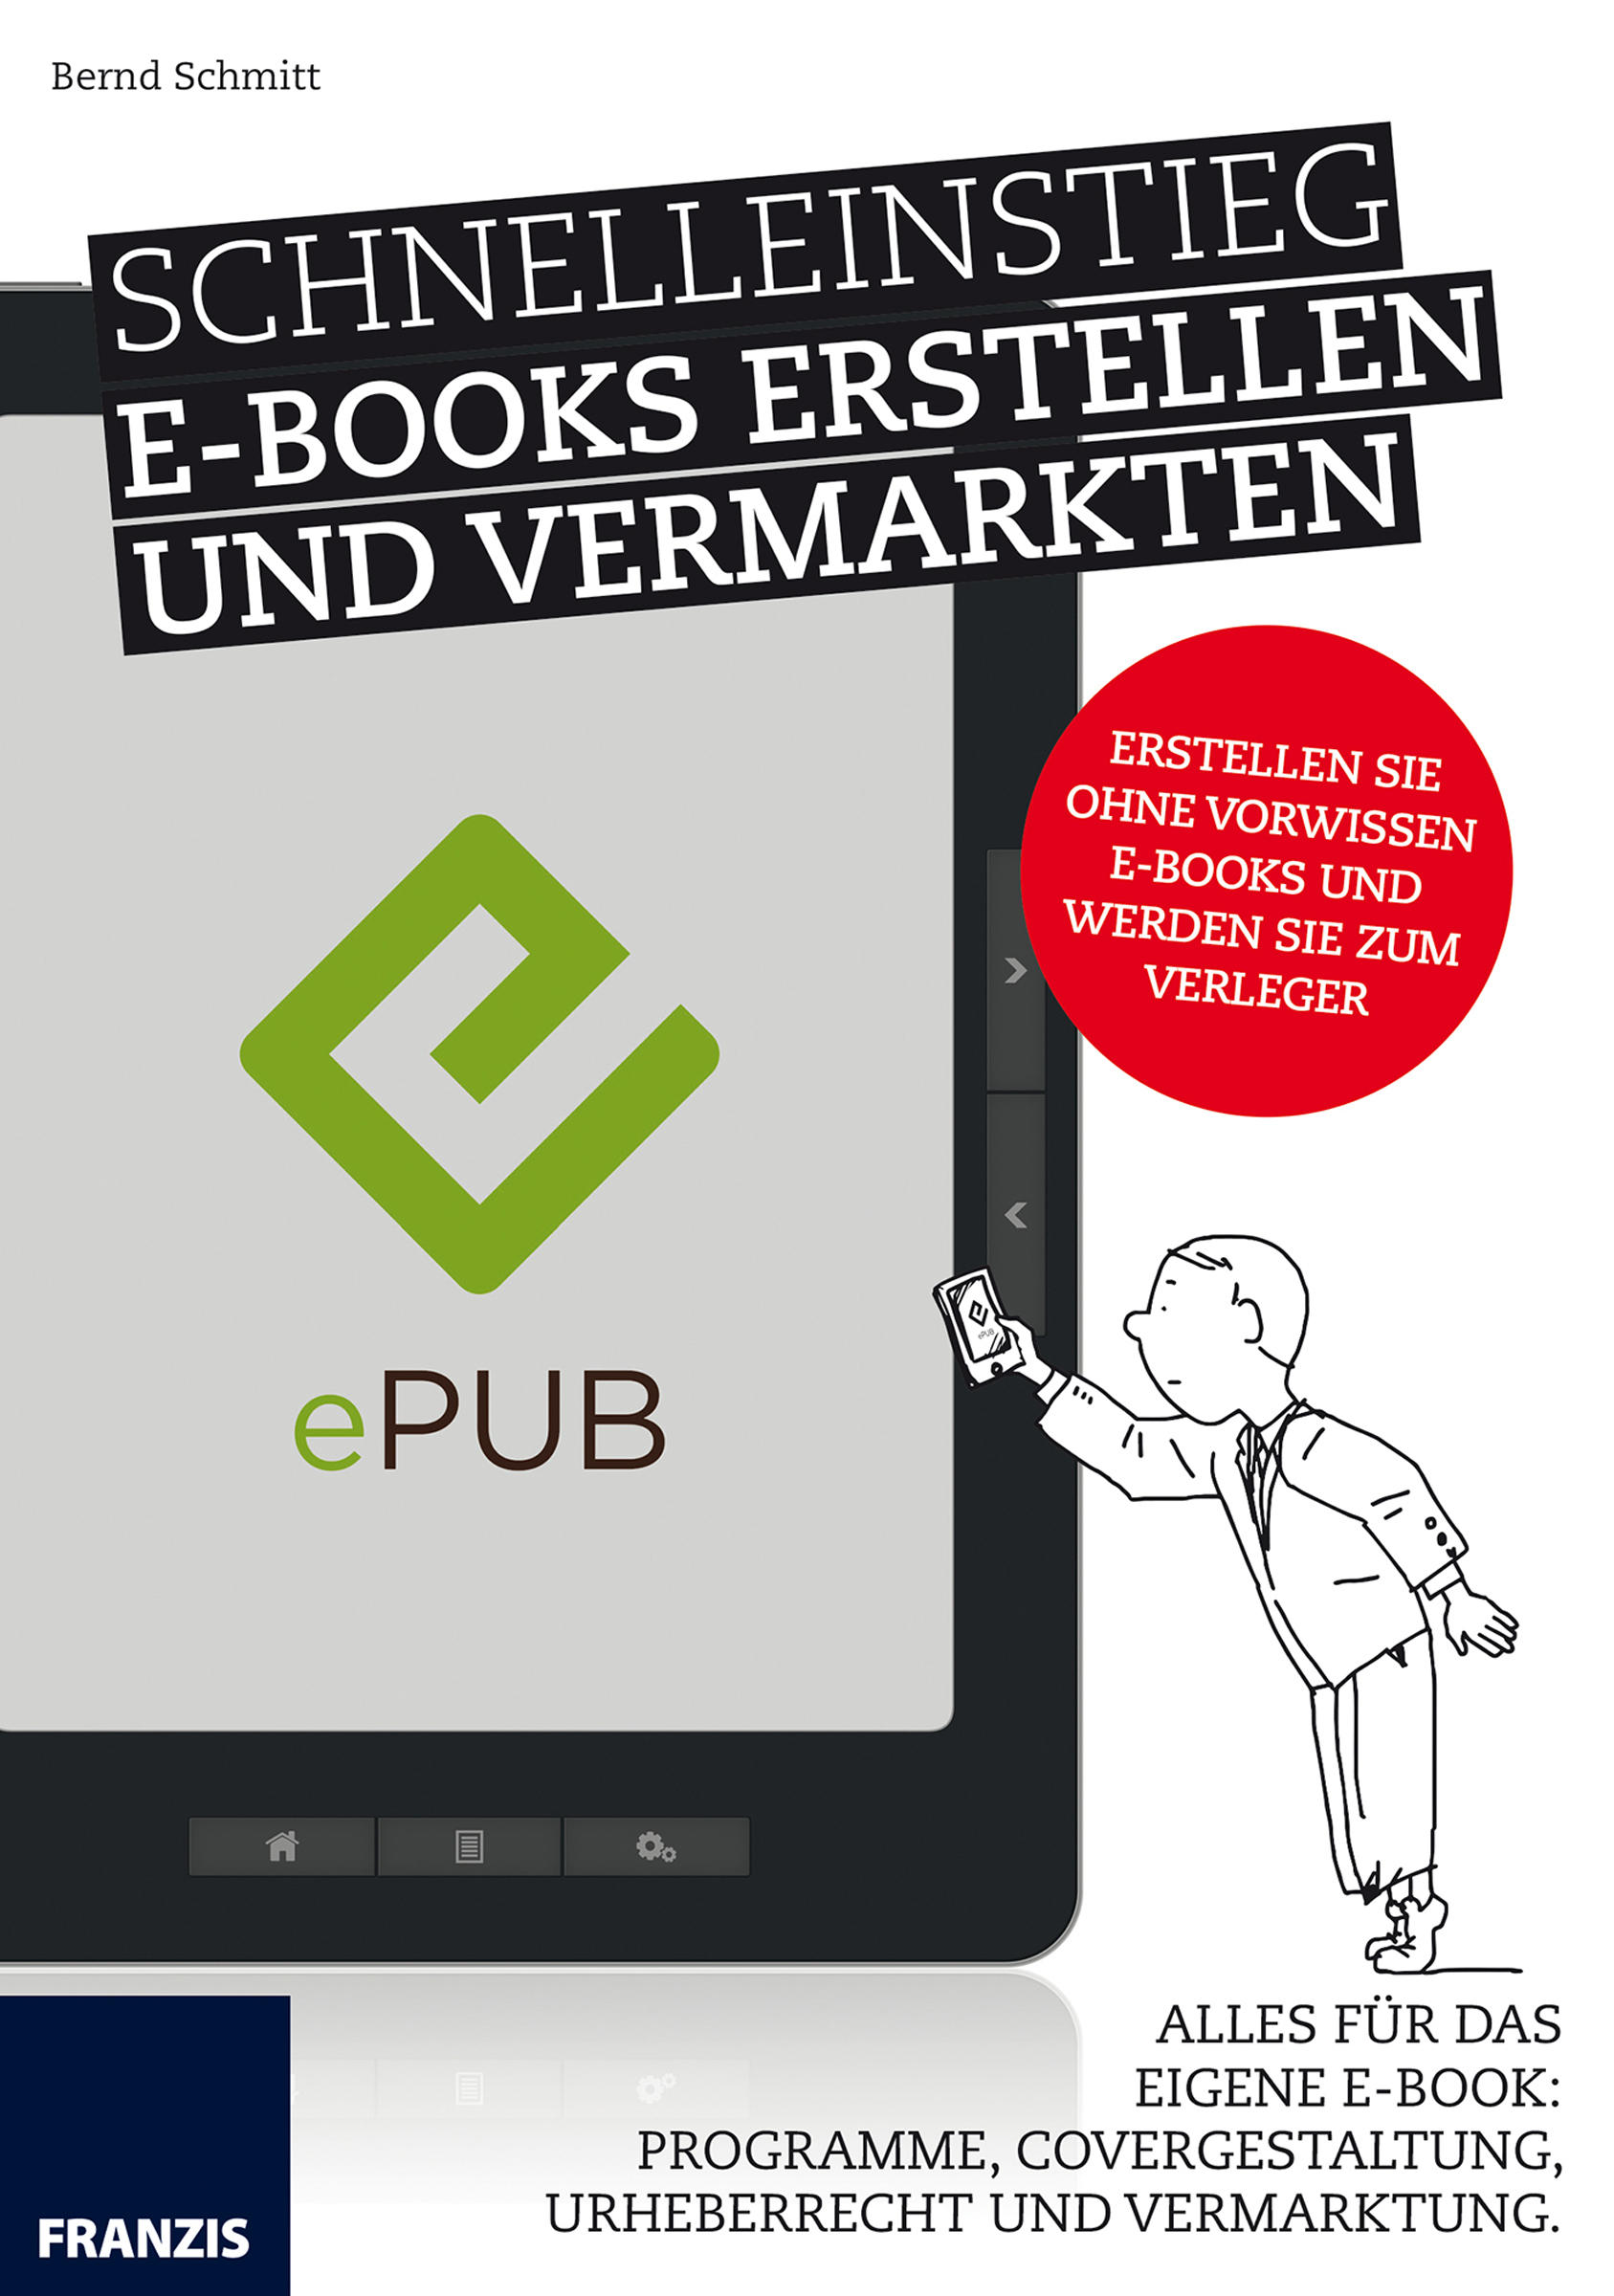 Bernd Schmitt Schnelleinstieg E-Books erstellen und vermarkten j schmitt air variе